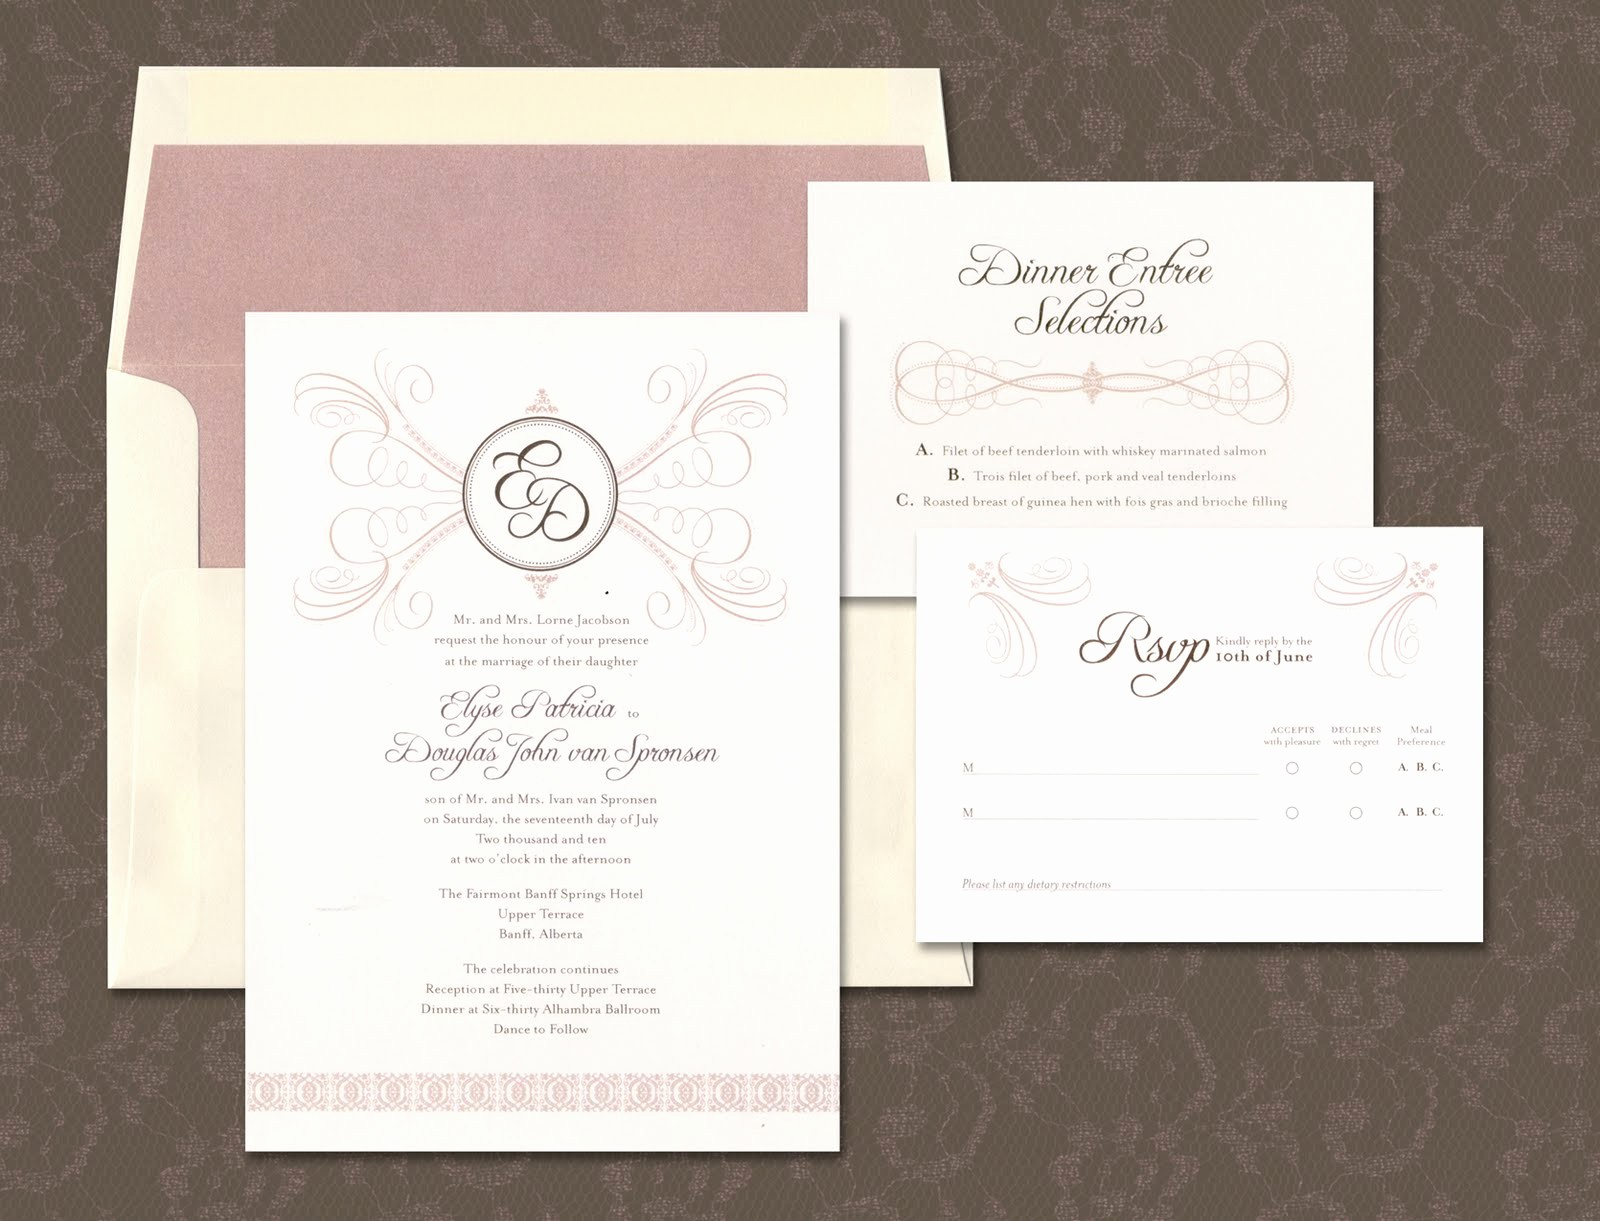 Free Word Wedding Program Template Elegant Lovely Free Printable Wedding Program Templates Word